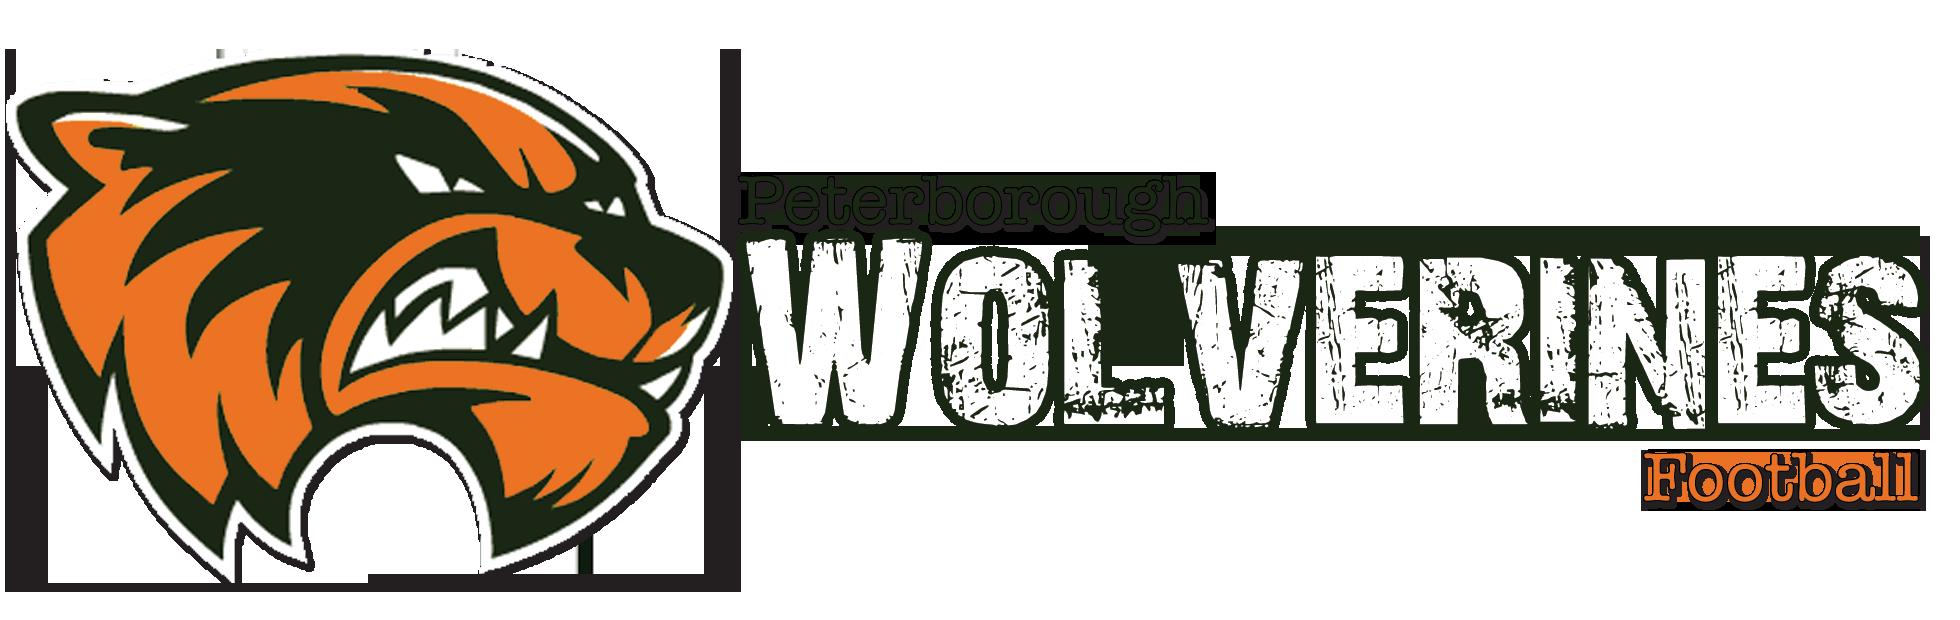 Peterborough Wolverines